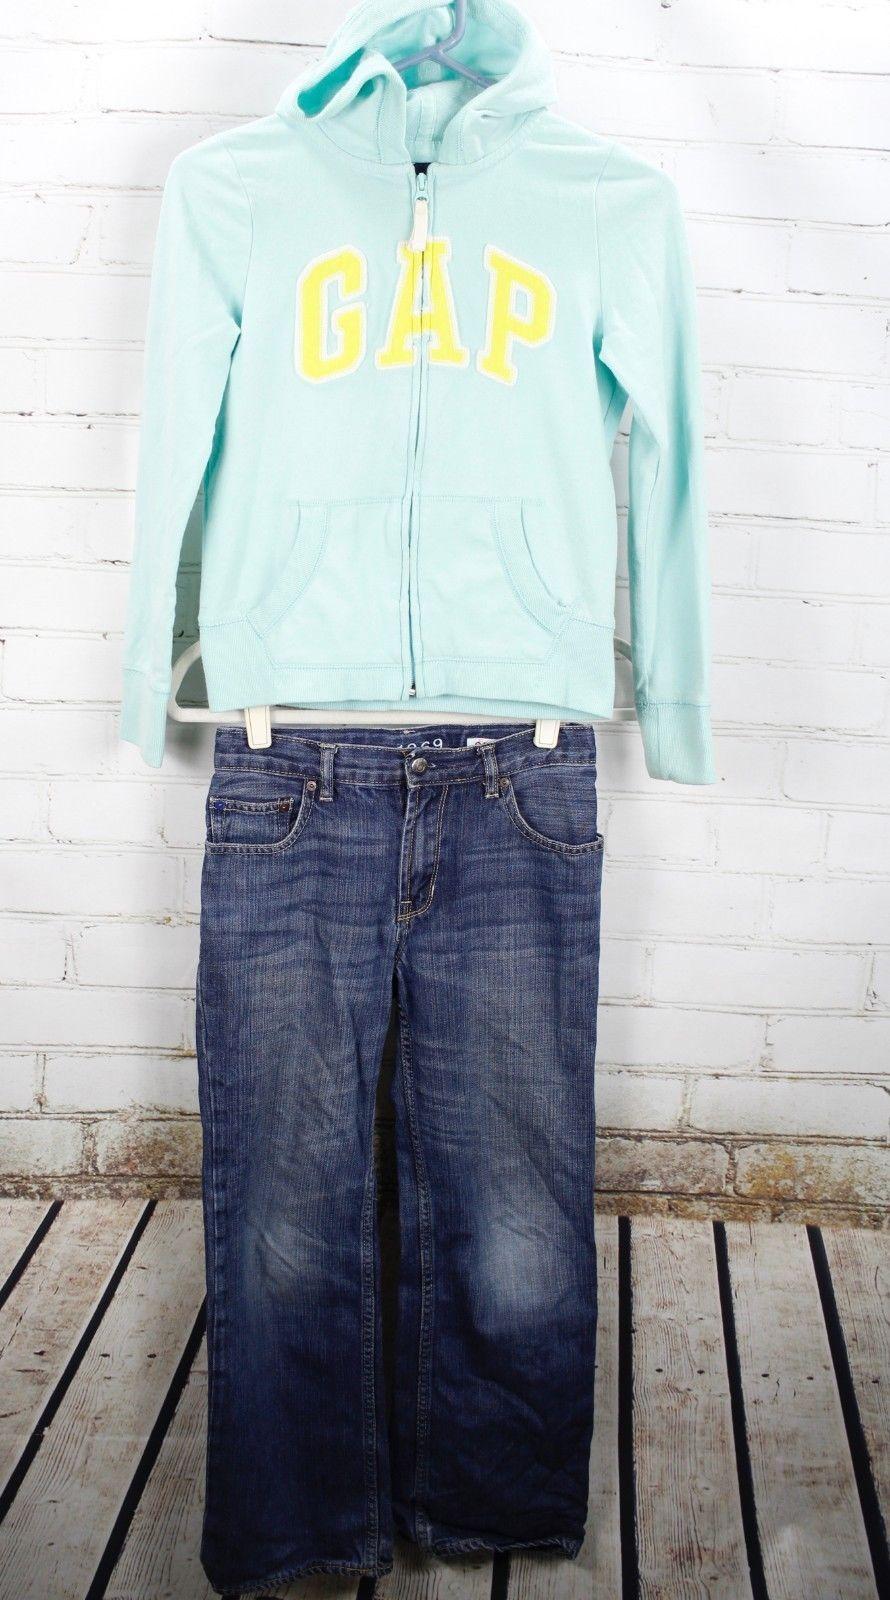 Gap Kids Logo Full Zip Hoodie Sweatshirt + Jeans Girls Size L 10 Outfit Set